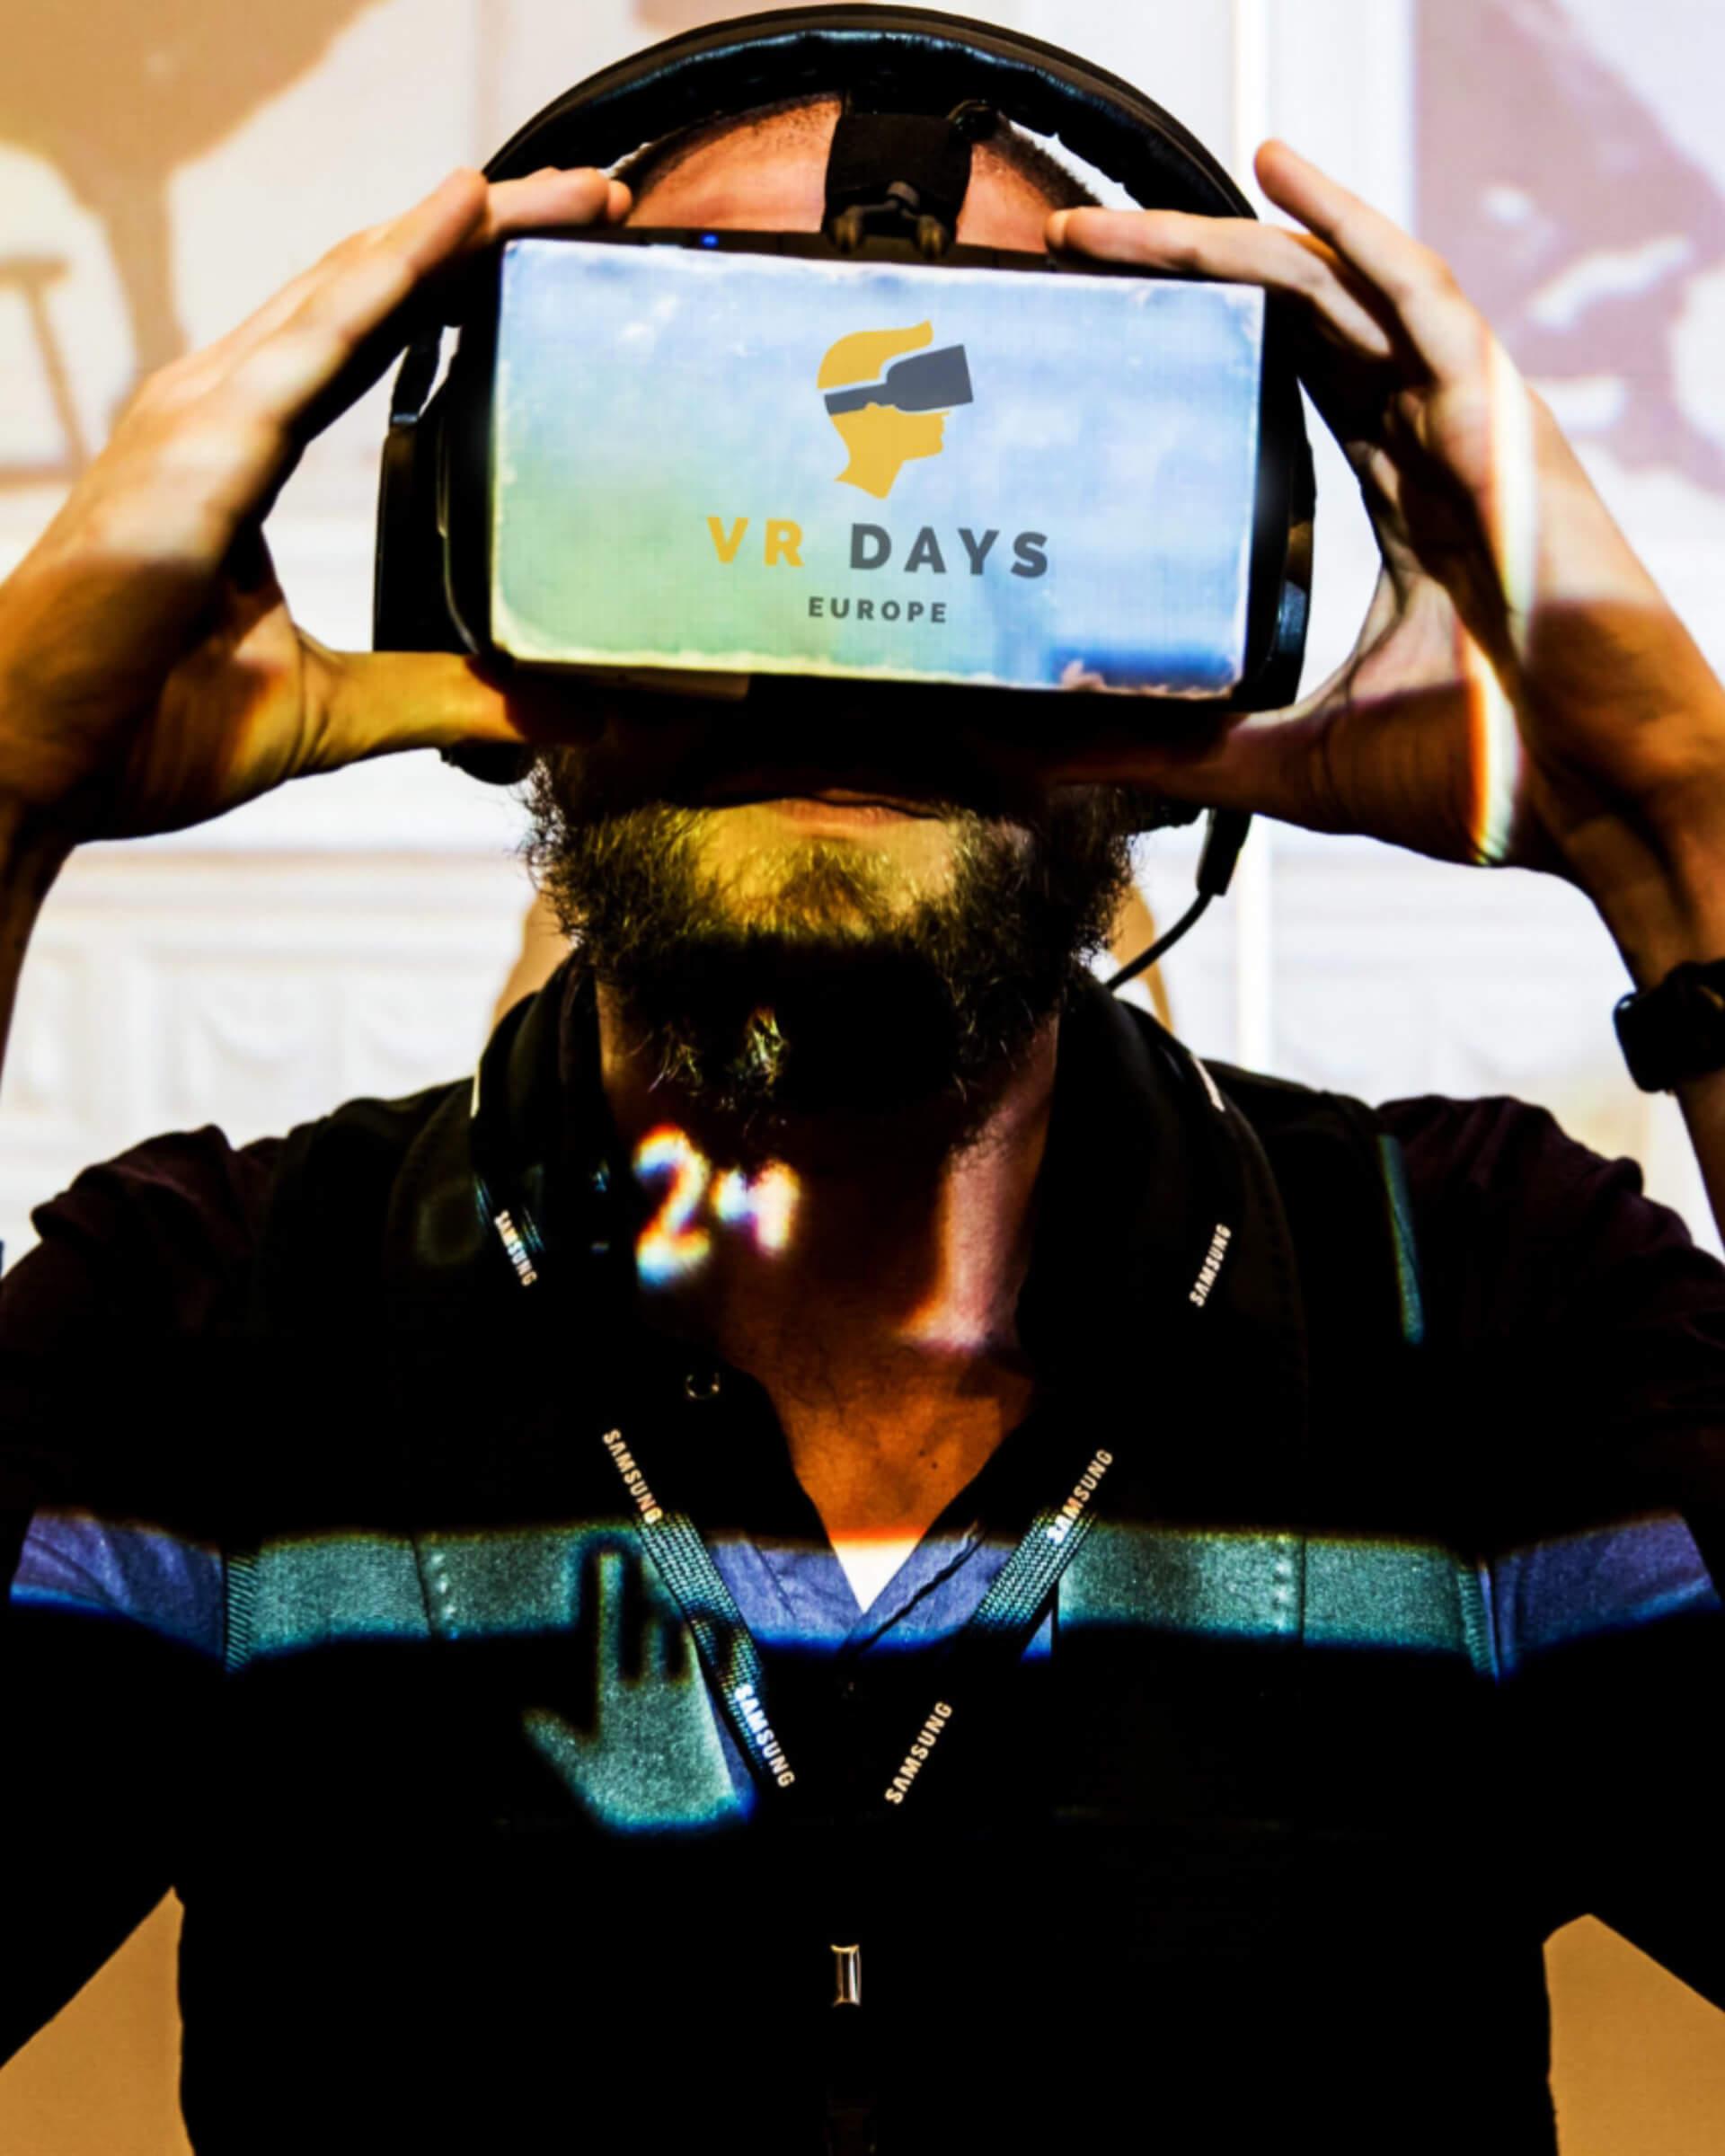 VR Days Europe -